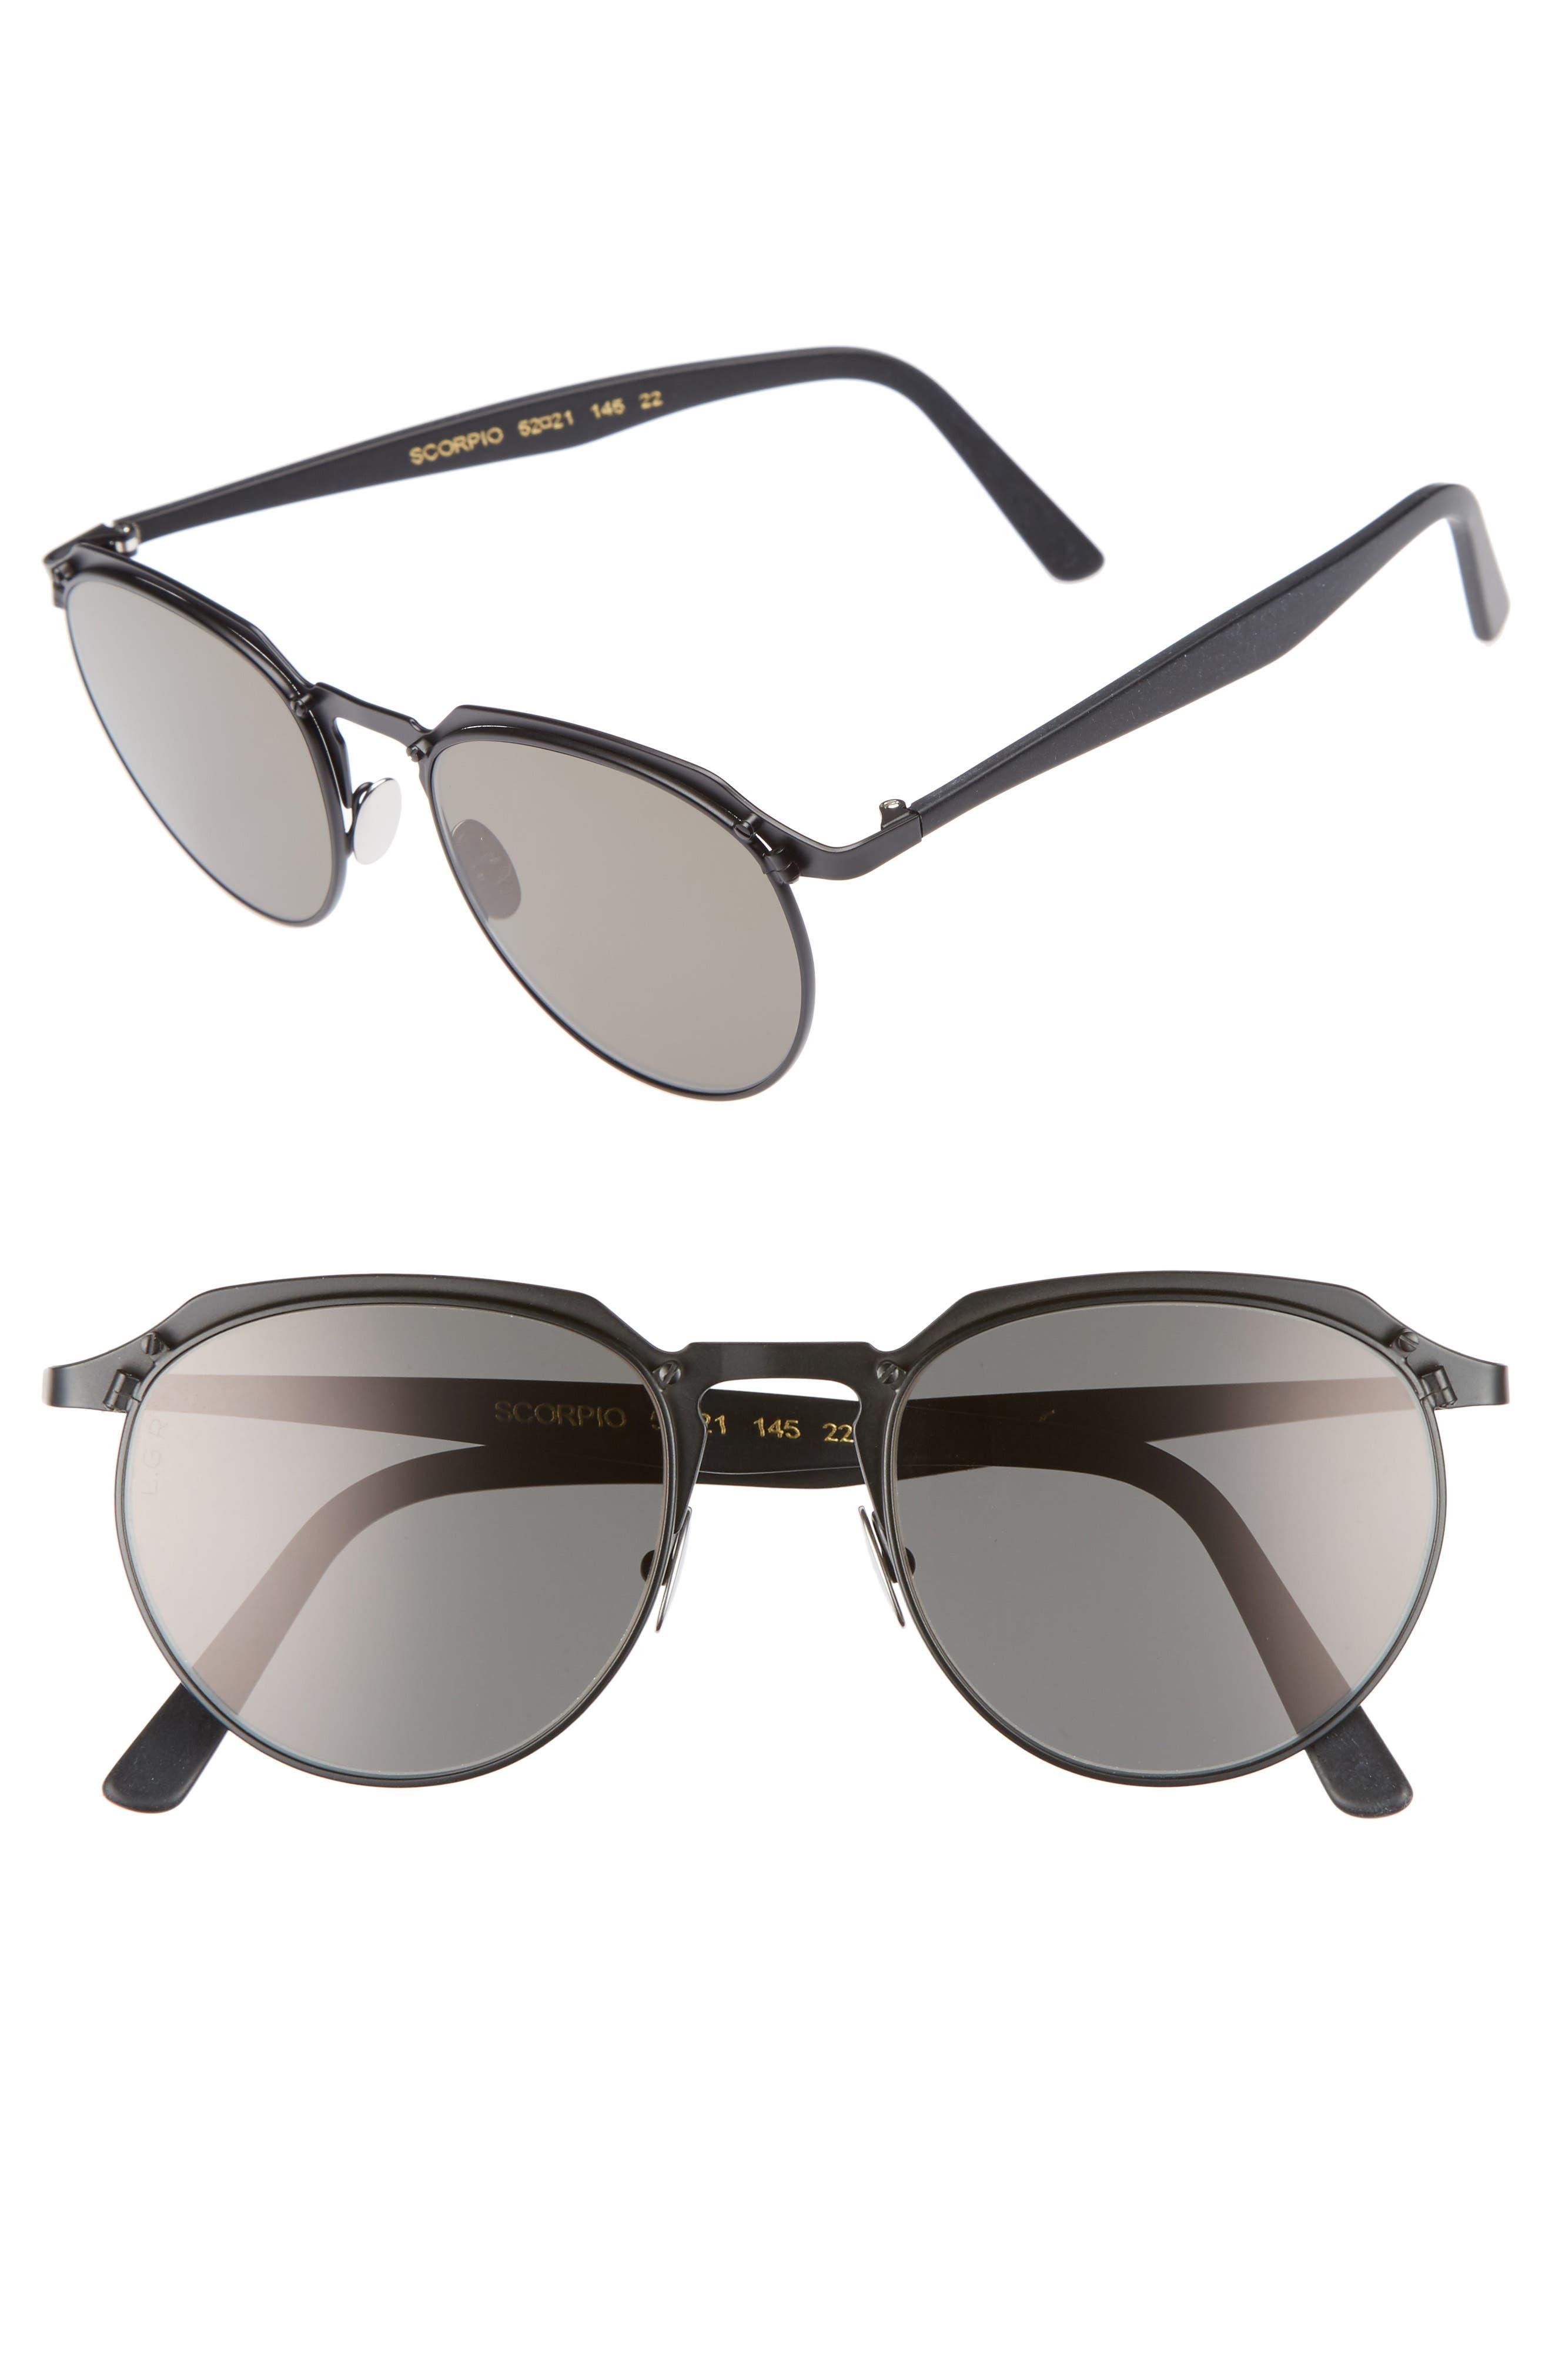 Scorpio 52mm Sunglasses,                             Main thumbnail 1, color,                             001